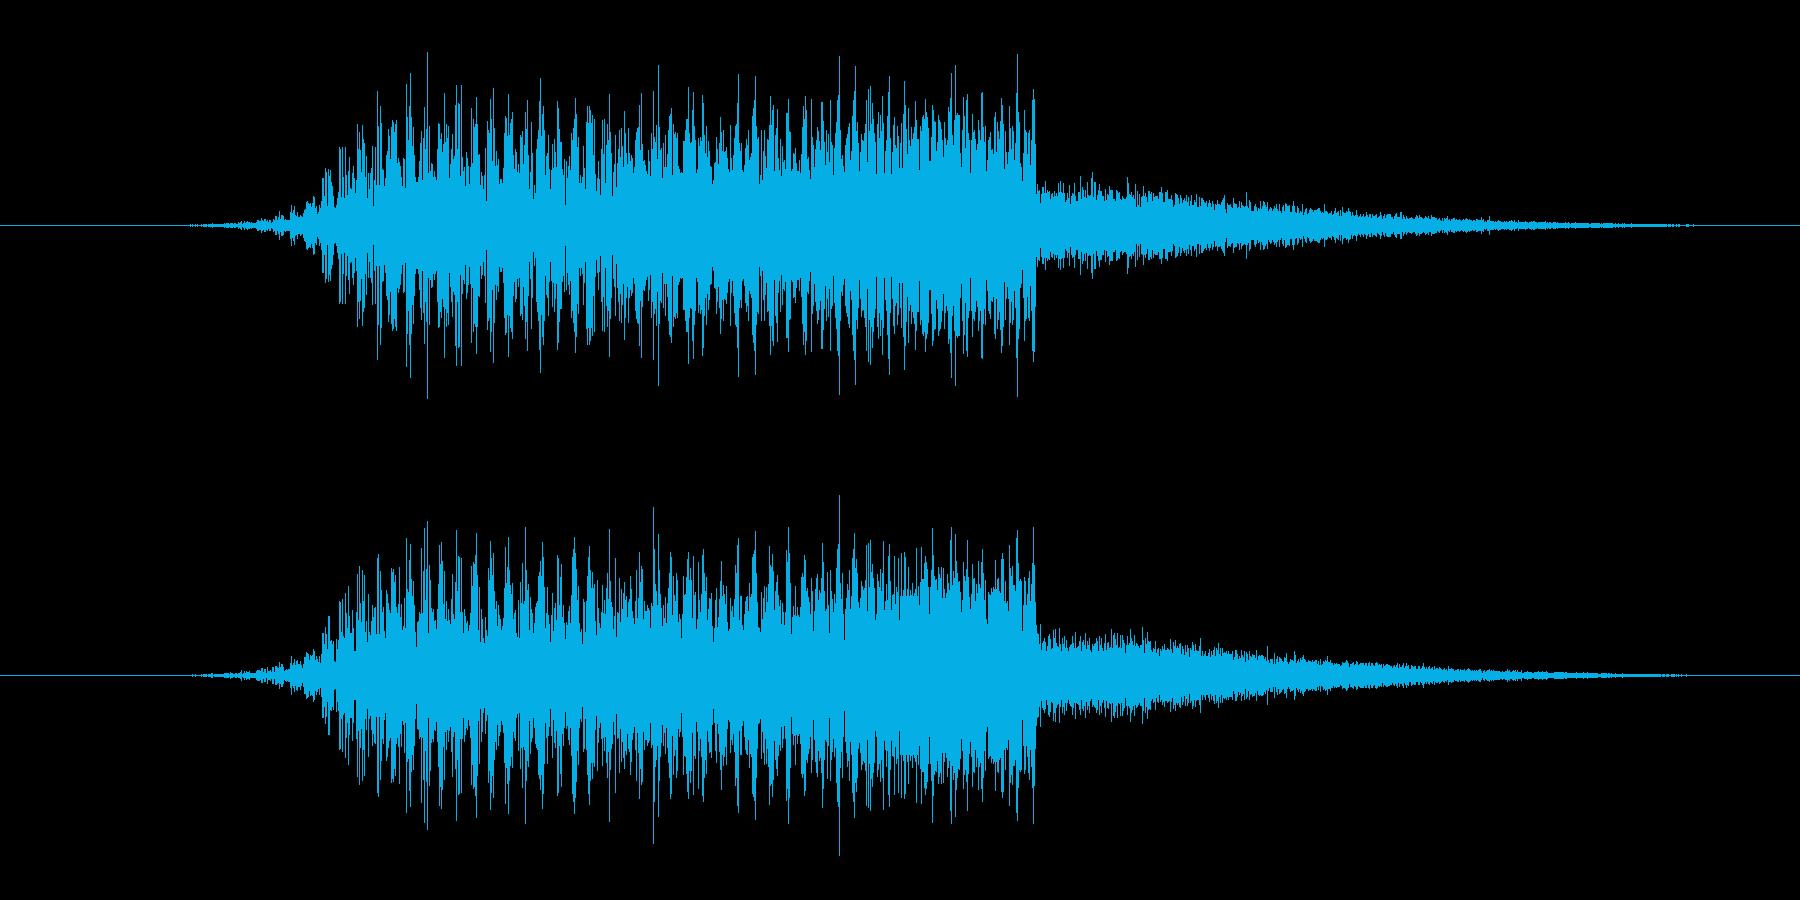 GET PowerUP 普通の再生済みの波形